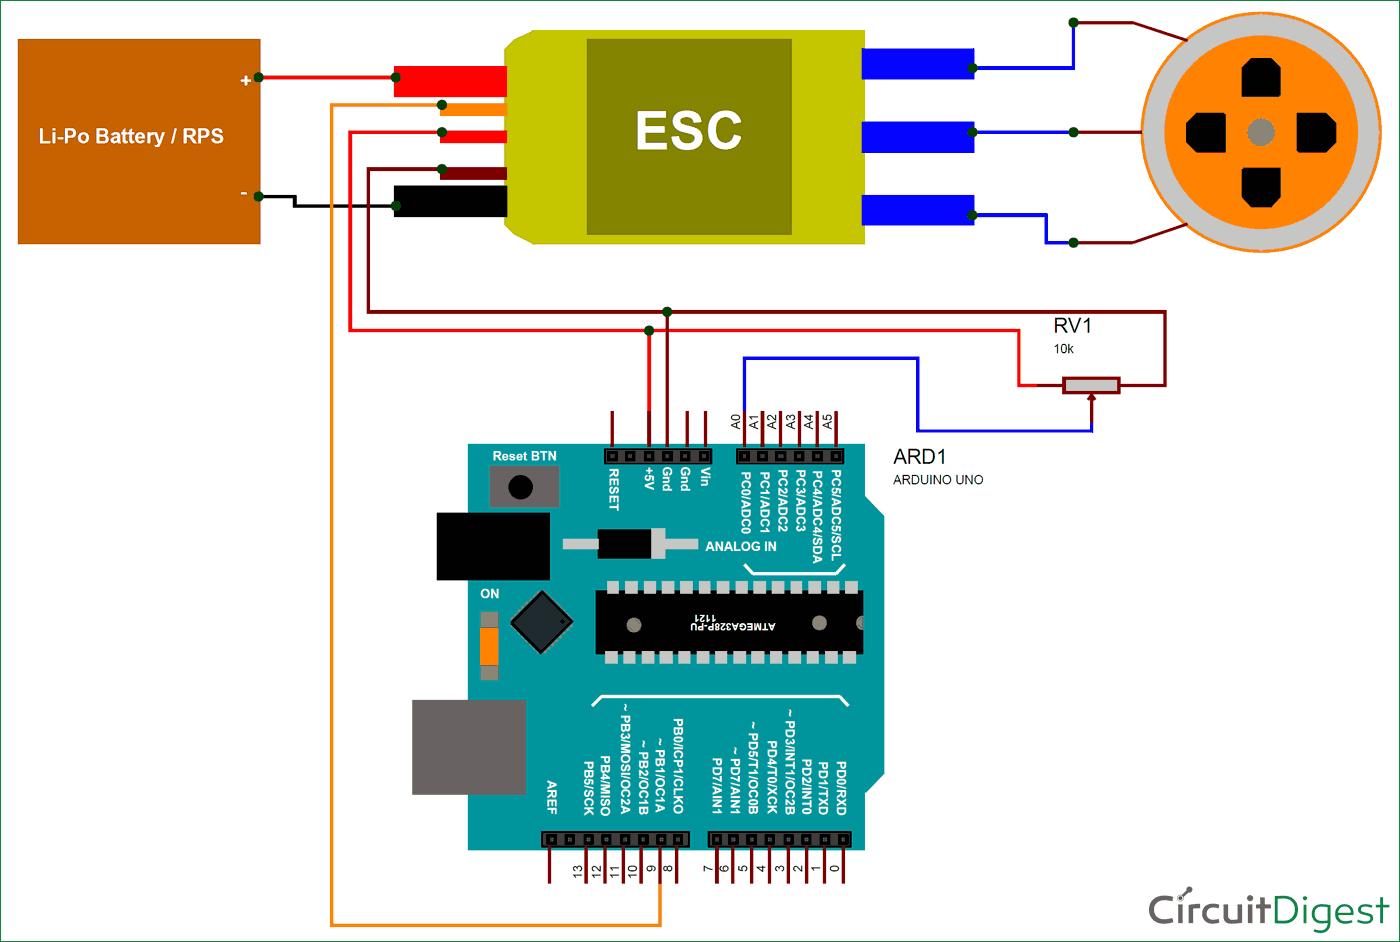 medium resolution of circuit diagram for controlling brushless dc motor using arduino